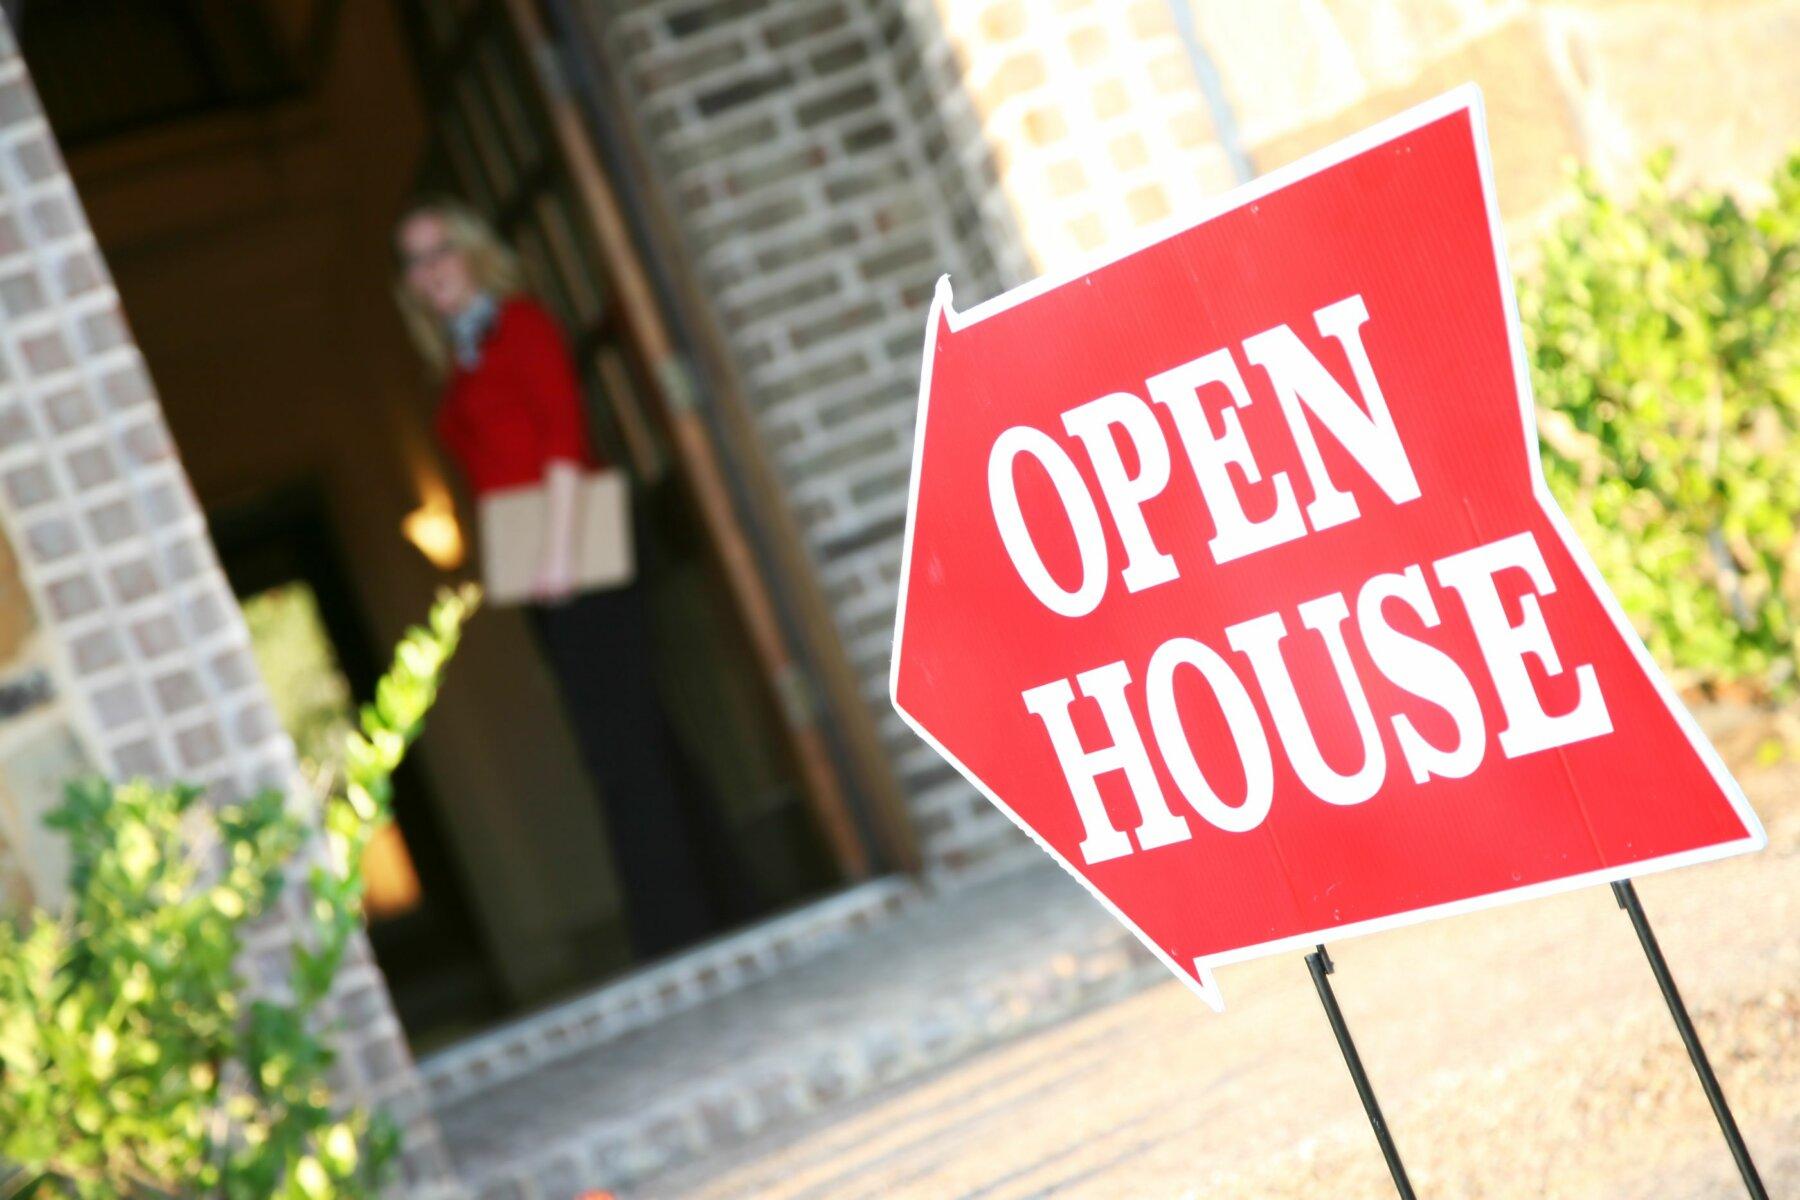 House buyer in Lampasas TX